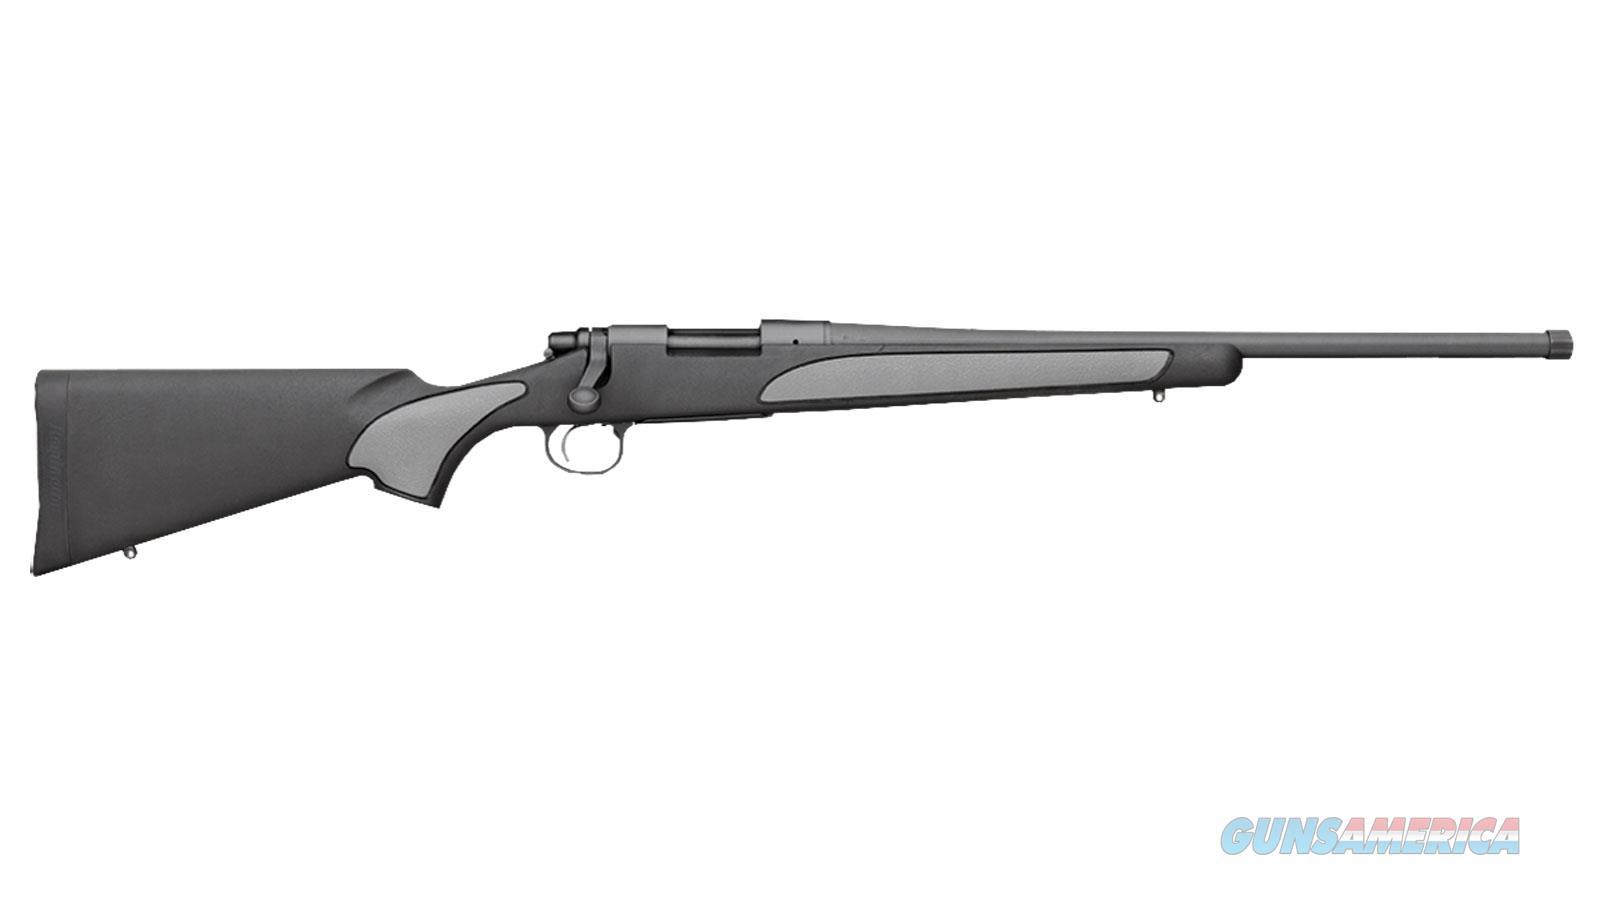 Remington 700 Sps 308Win 20 Thrd Blk Syn Adj Trig 84159  Guns > Rifles > R Misc Rifles